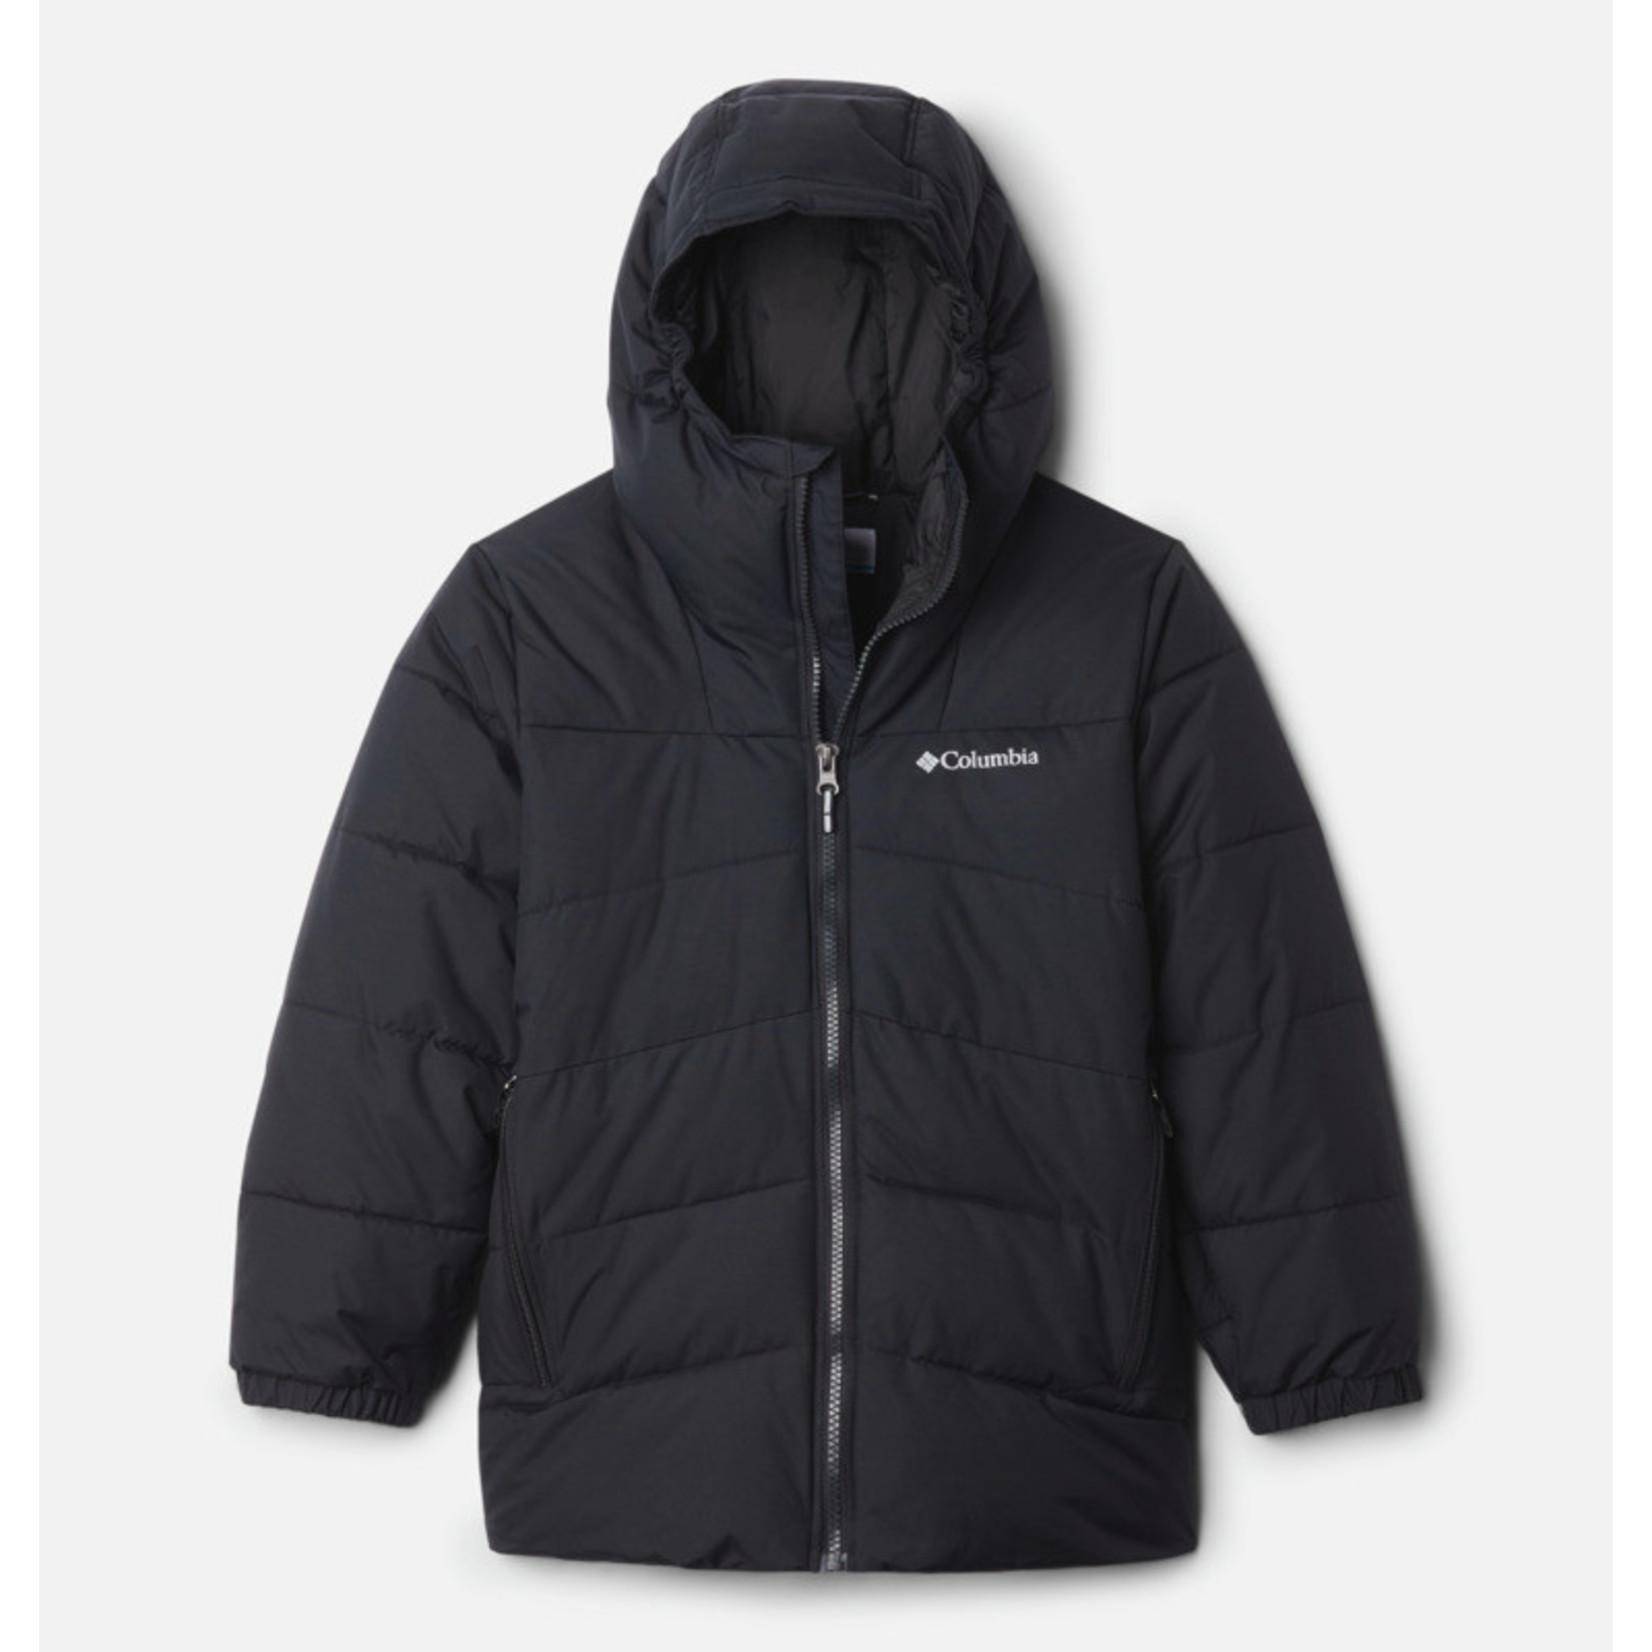 Columbia Columbia Winter Jacket, Arctic Blast, Boys